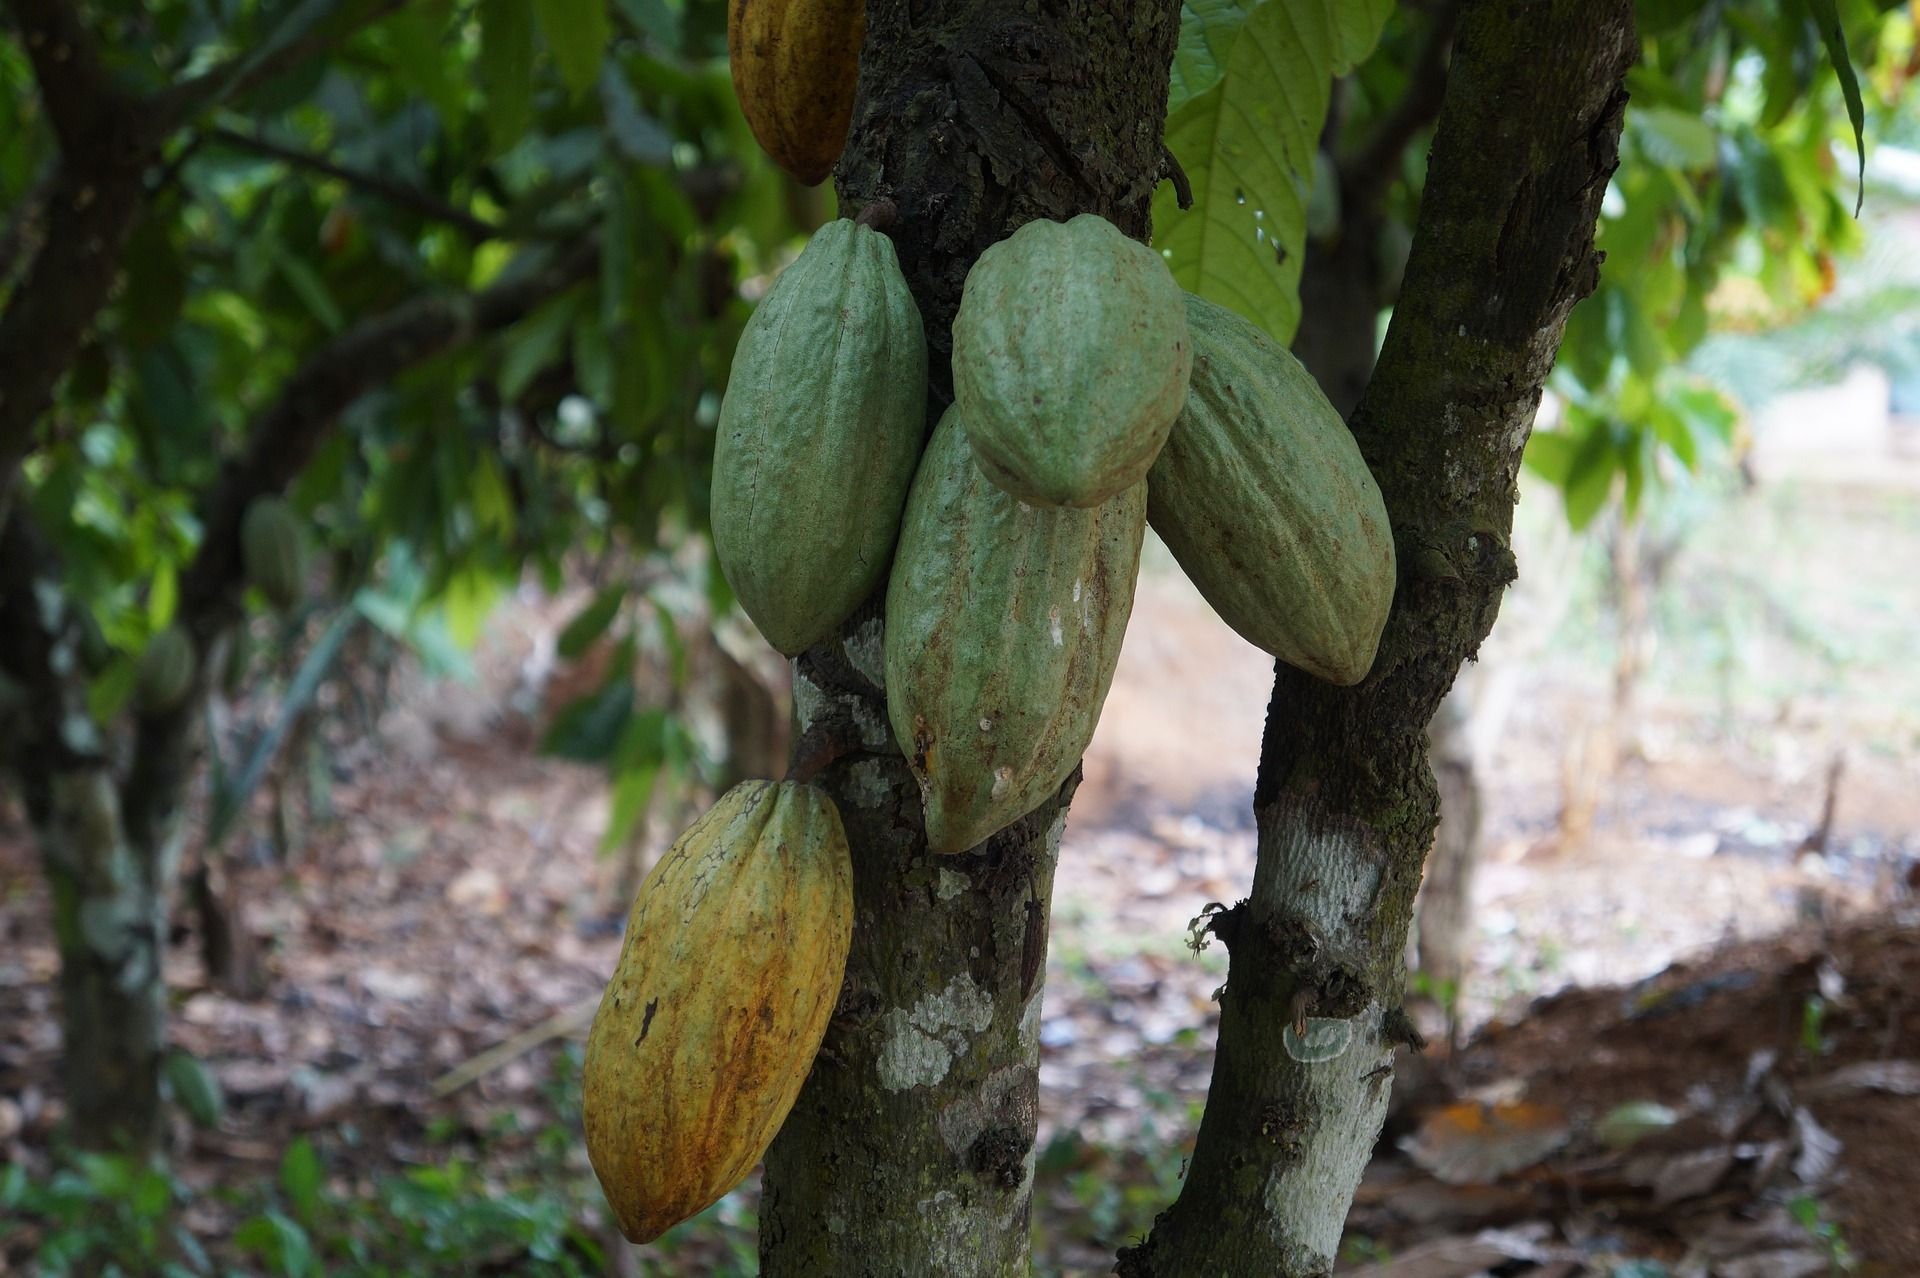 Cocoa pods in Ghana